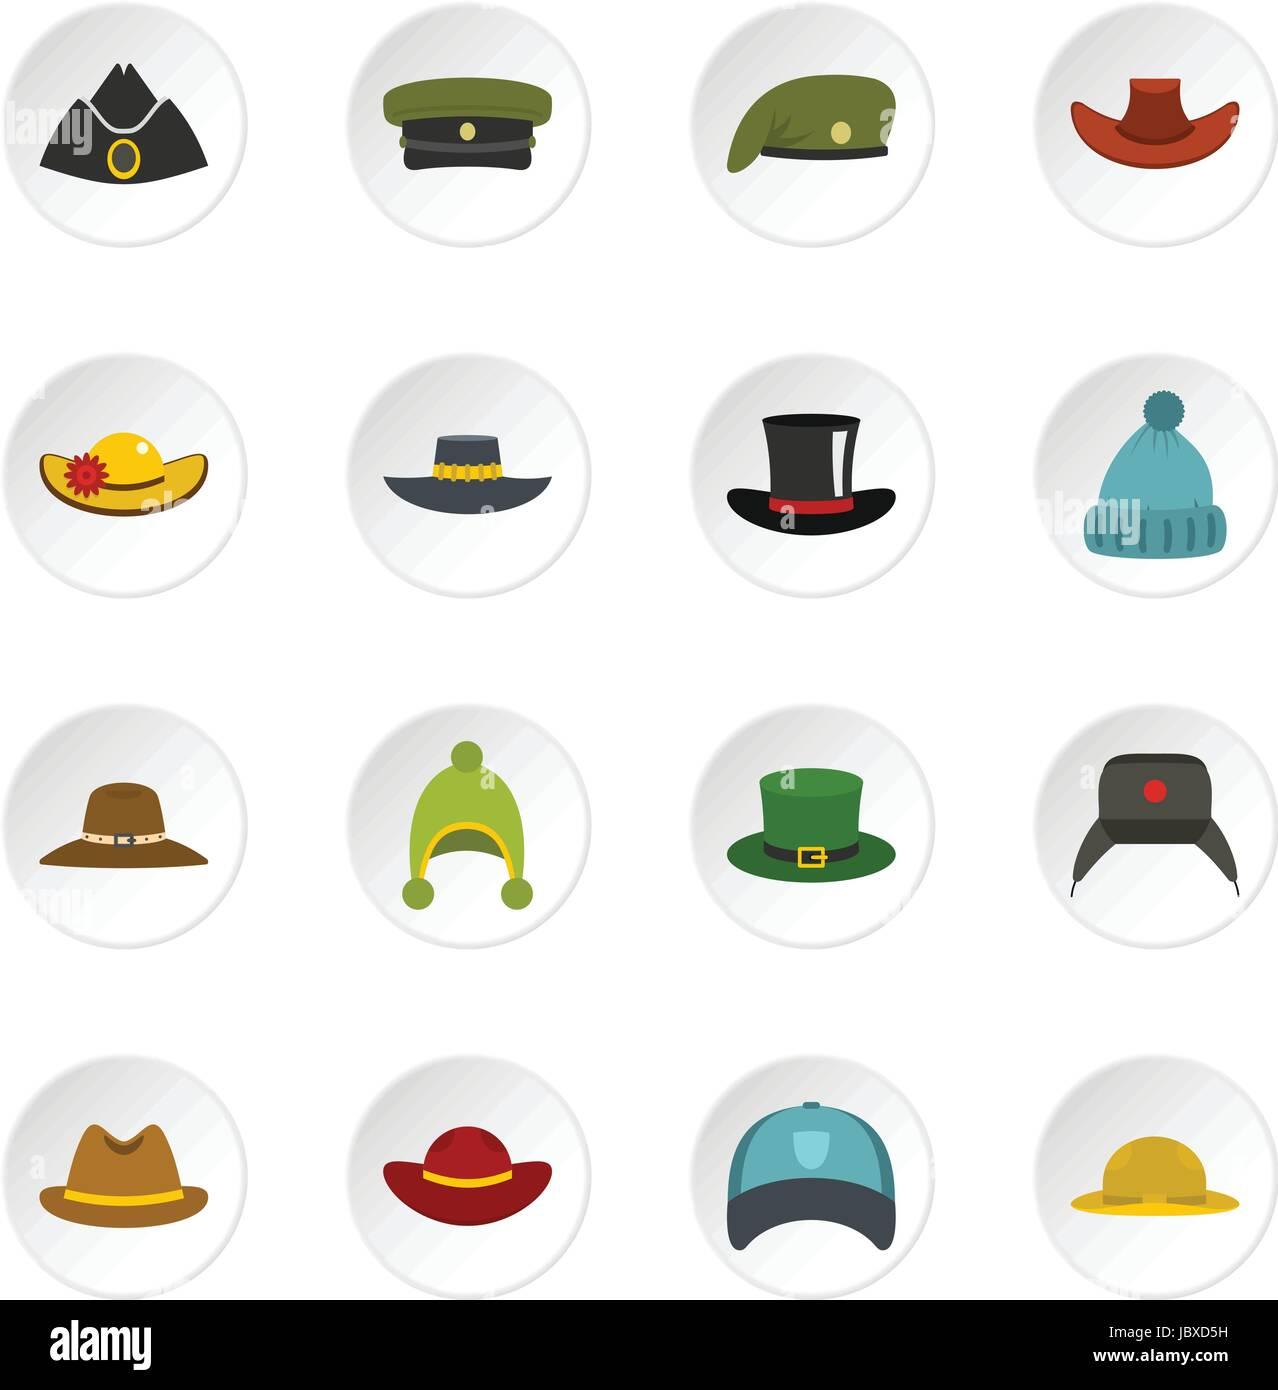 Headdress hat icons set in flat style - Stock Image